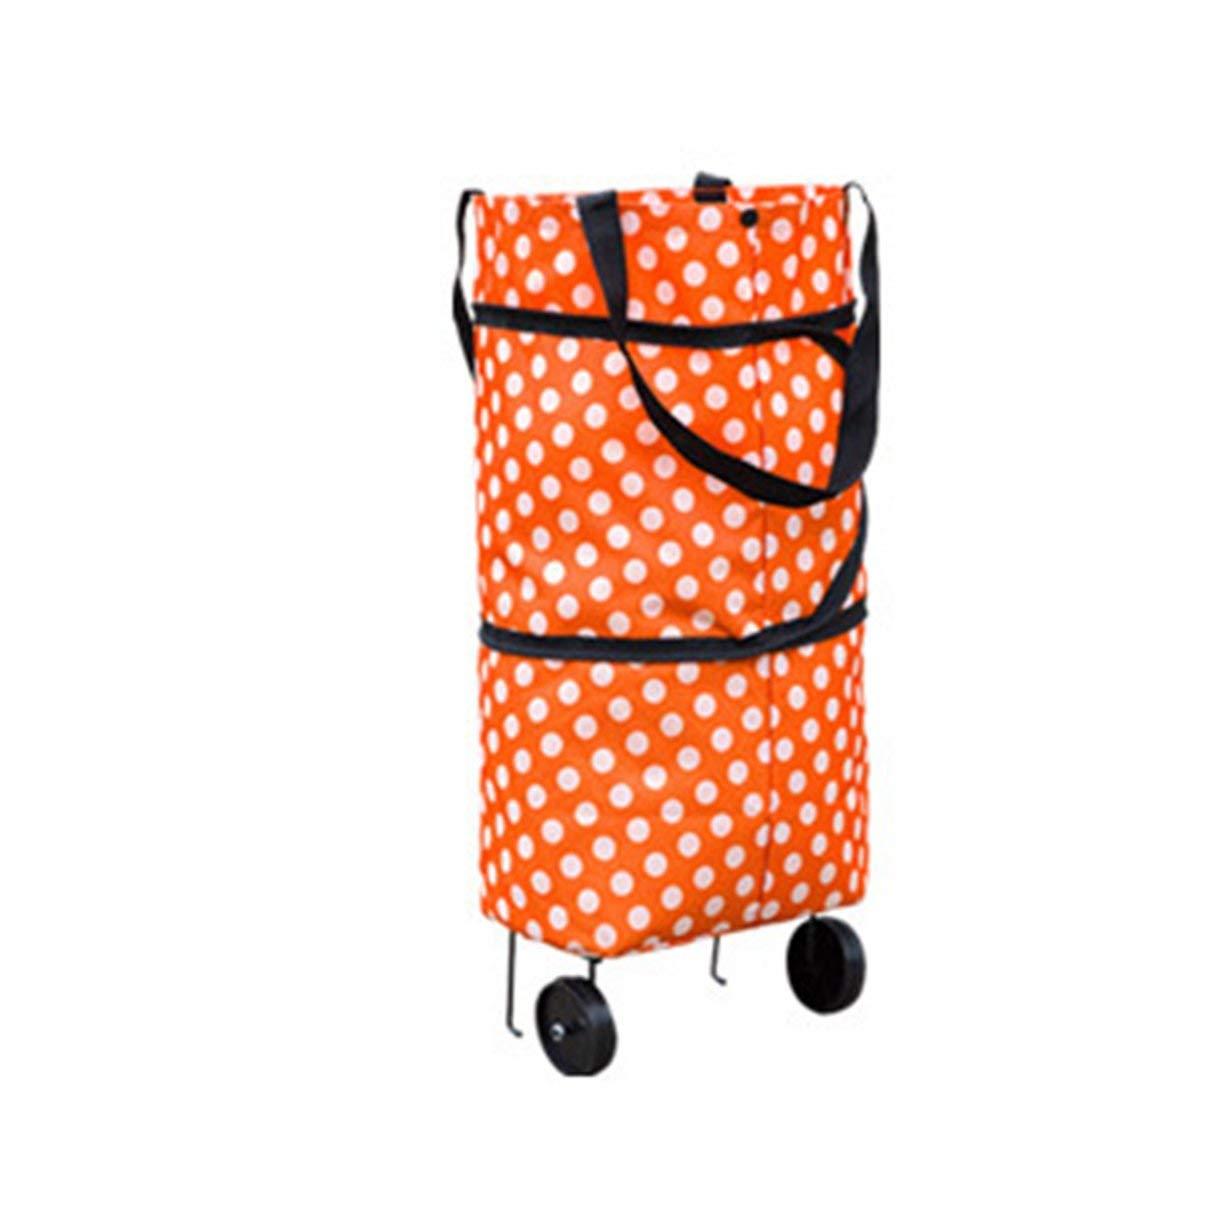 Shopping Trolley Wheel Bag,Fashionable Design Large Capacity Waterproof Oxford Cloth Foldable Shopping Trolley Wheel Bag Traval Cart Luggage Bag